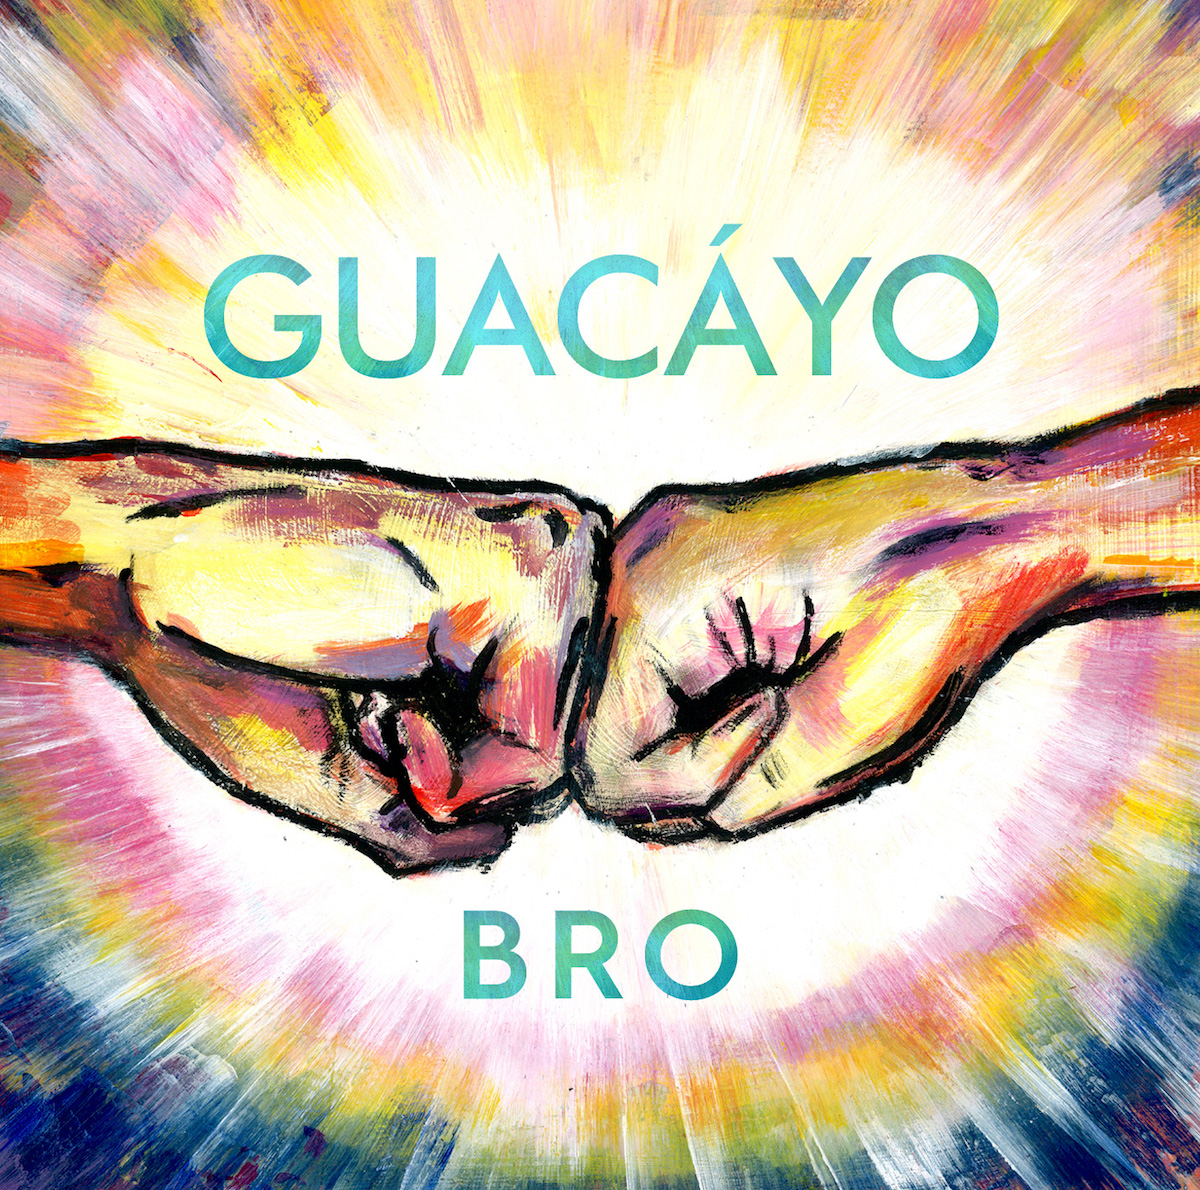 Guacayo_Bro_Cover